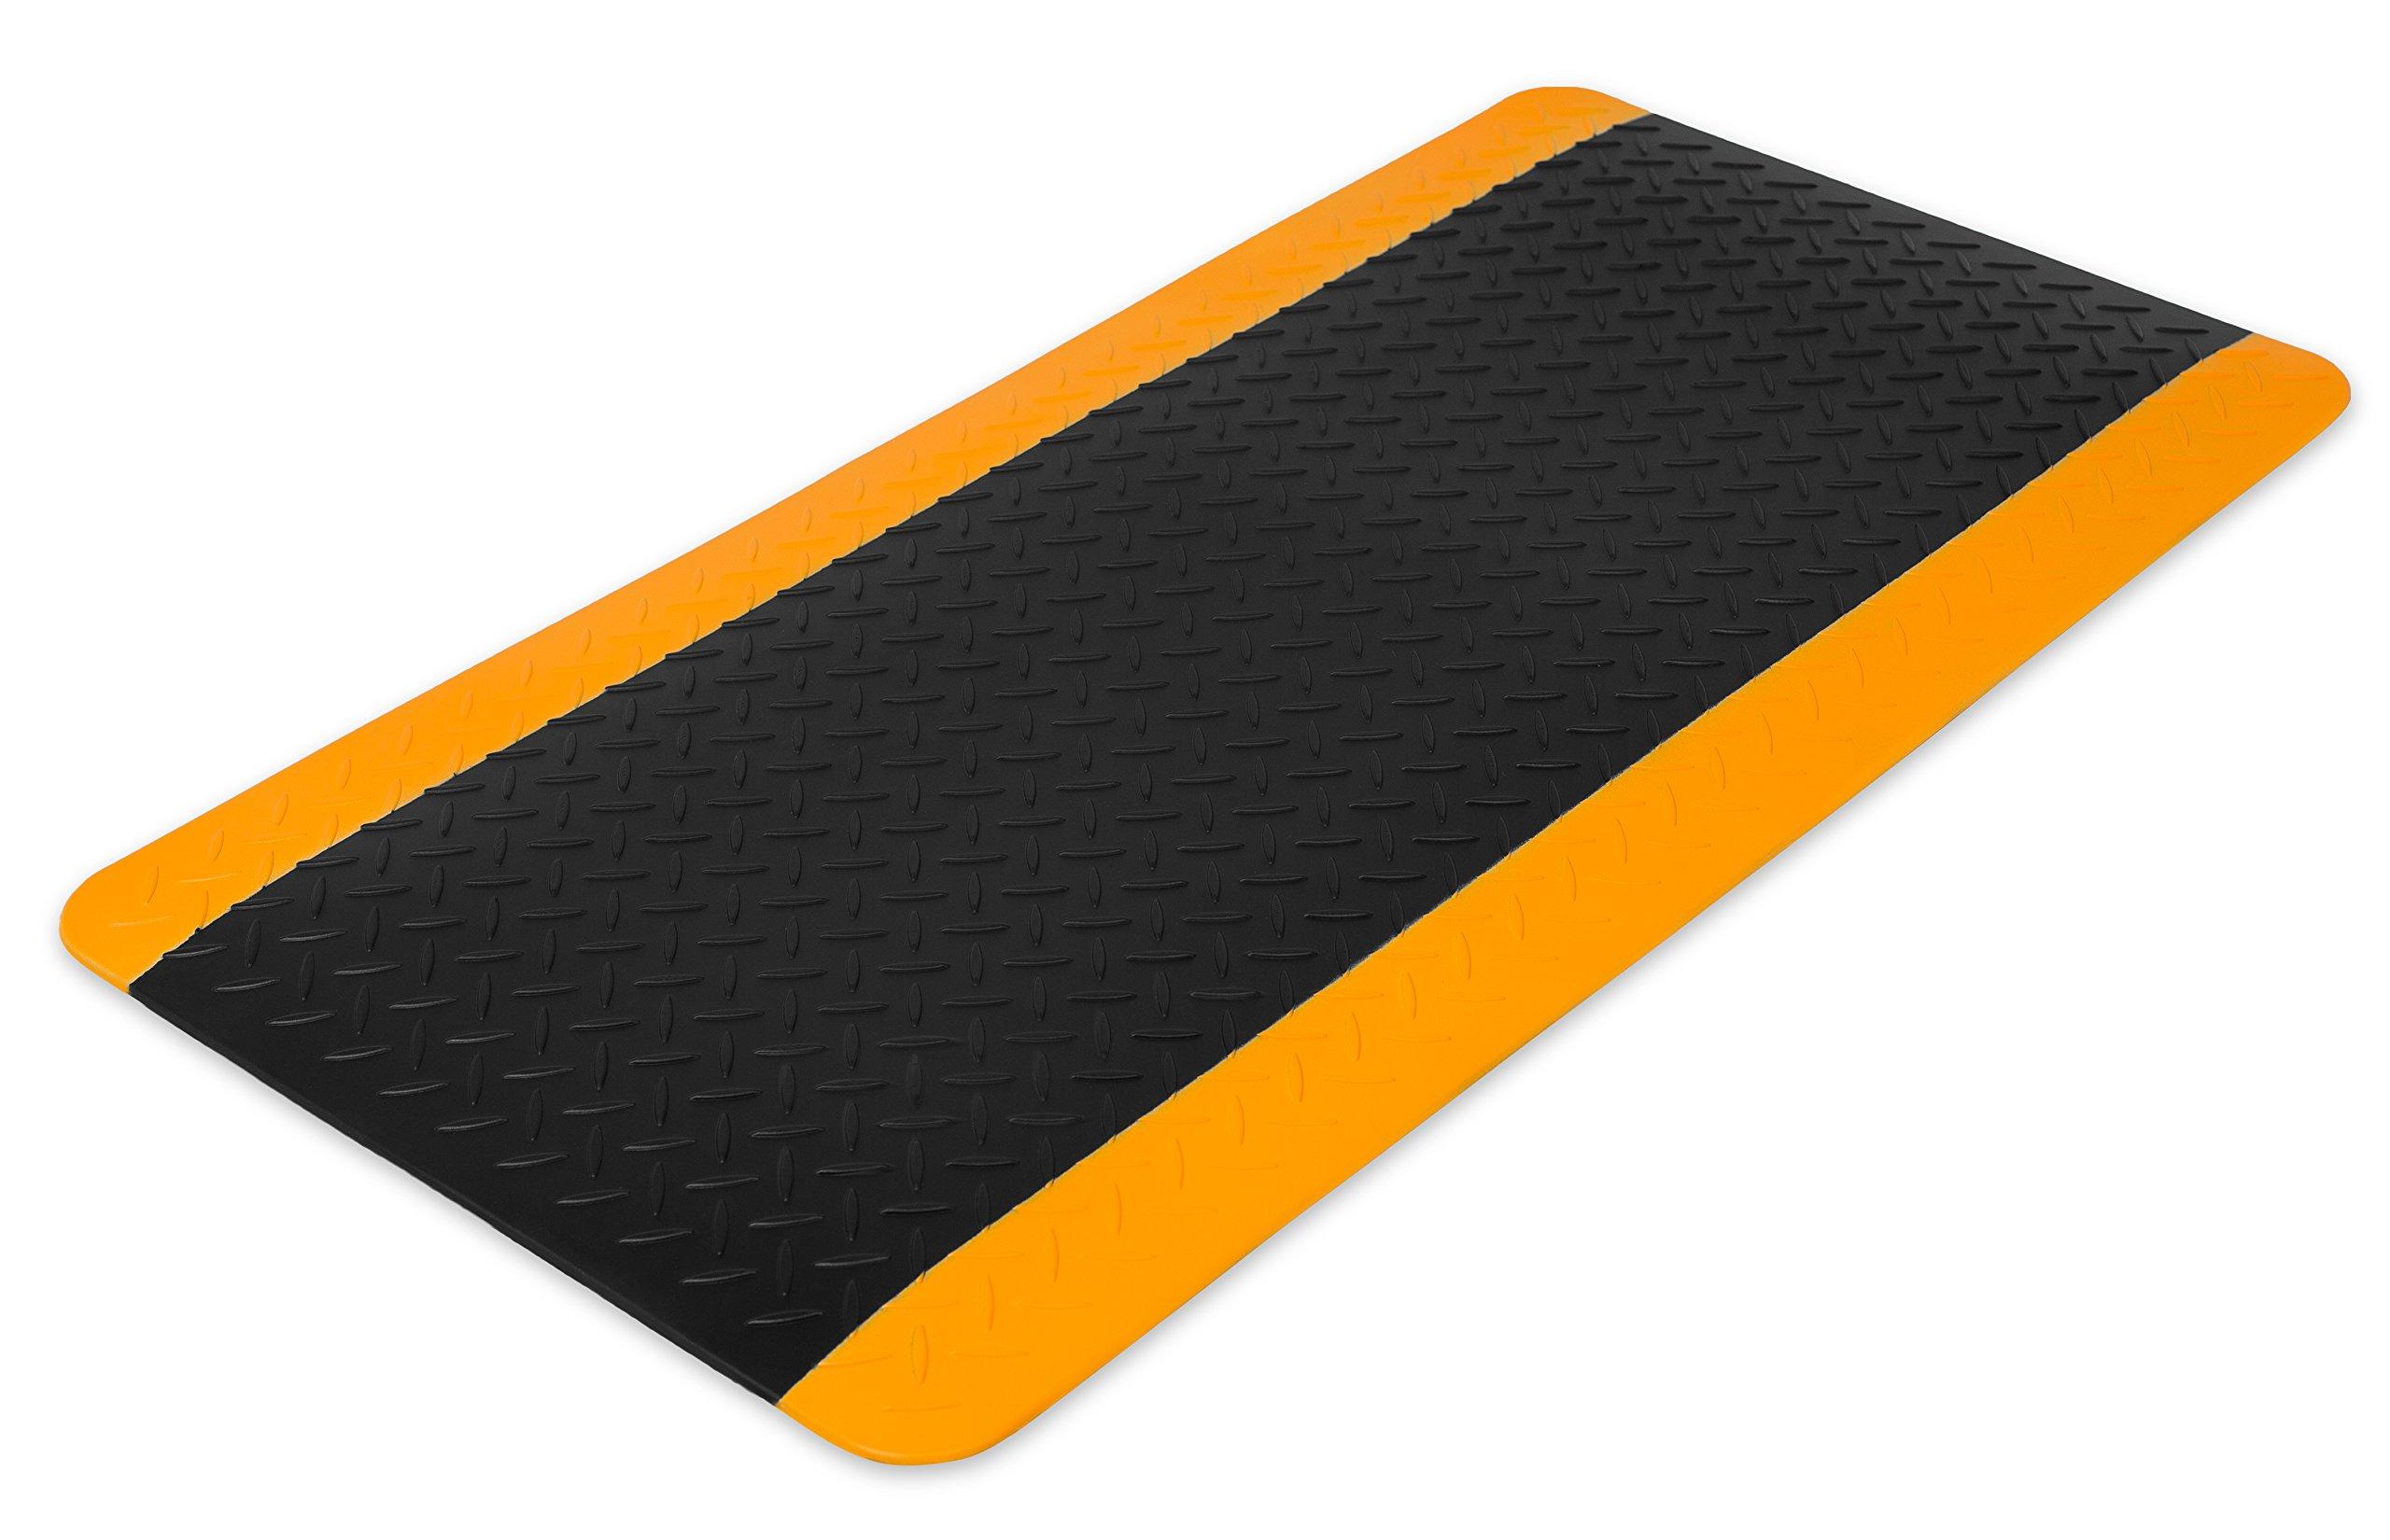 Internet's Best Anti Fatigue Comfort Mat | Cushioned Non-Slip Workshop Garage Office Standing Desk Mat | Ergonomic Floor Mat for Market Booths | Waterproof | 38.75 x 19.75 inches | Black by Internet's Best